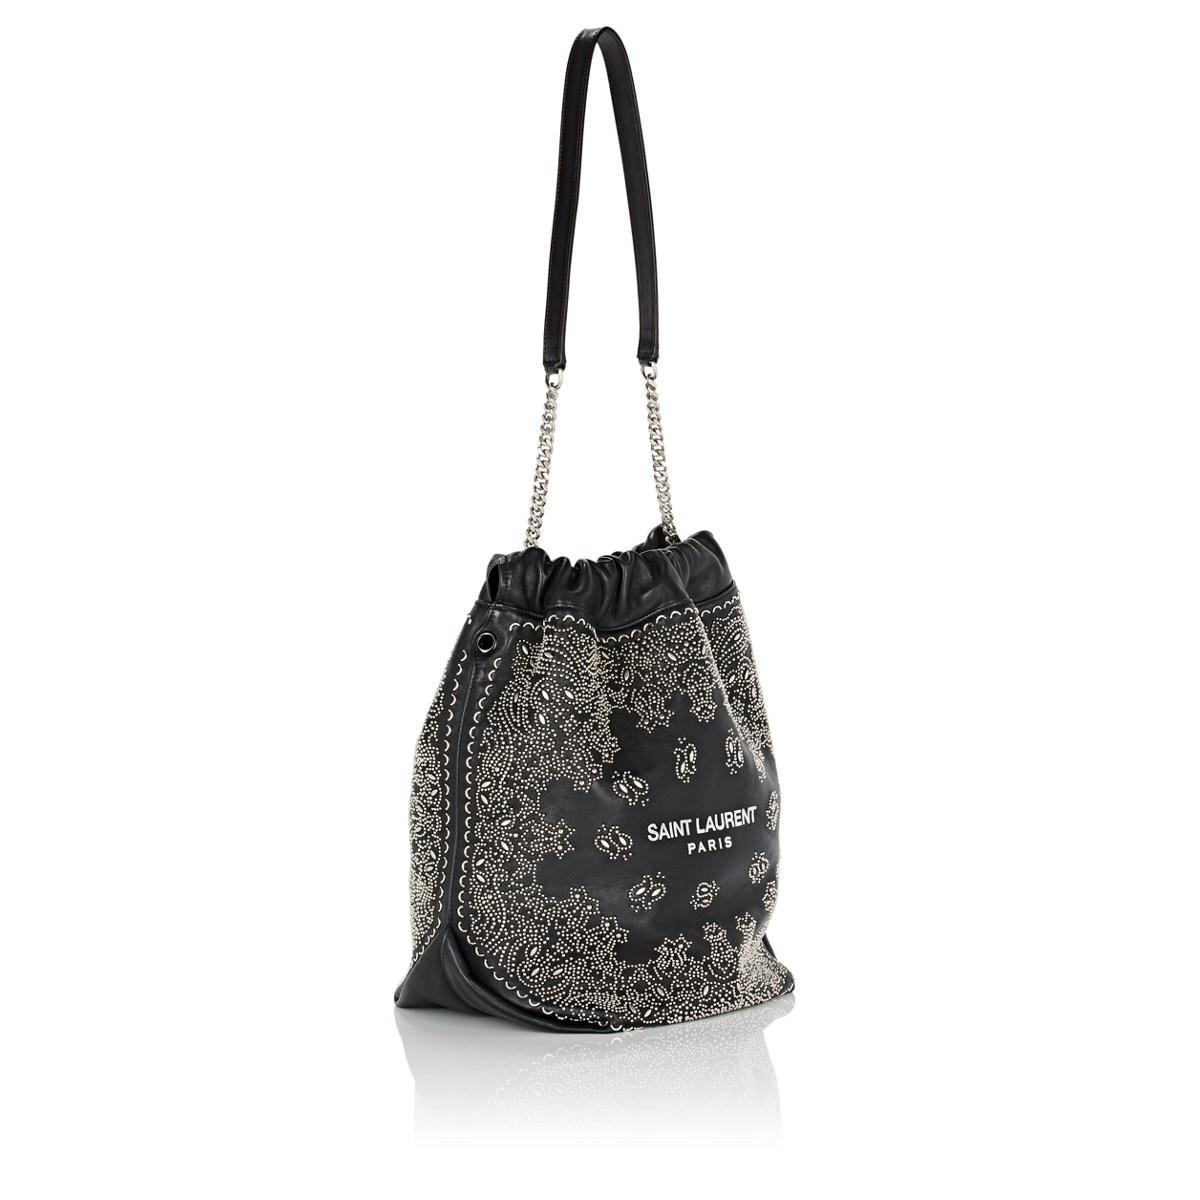 Saint Laurent - Black Teddy Sac Leather Bucket Bag - Lyst. View fullscreen 306a587f7c9ed